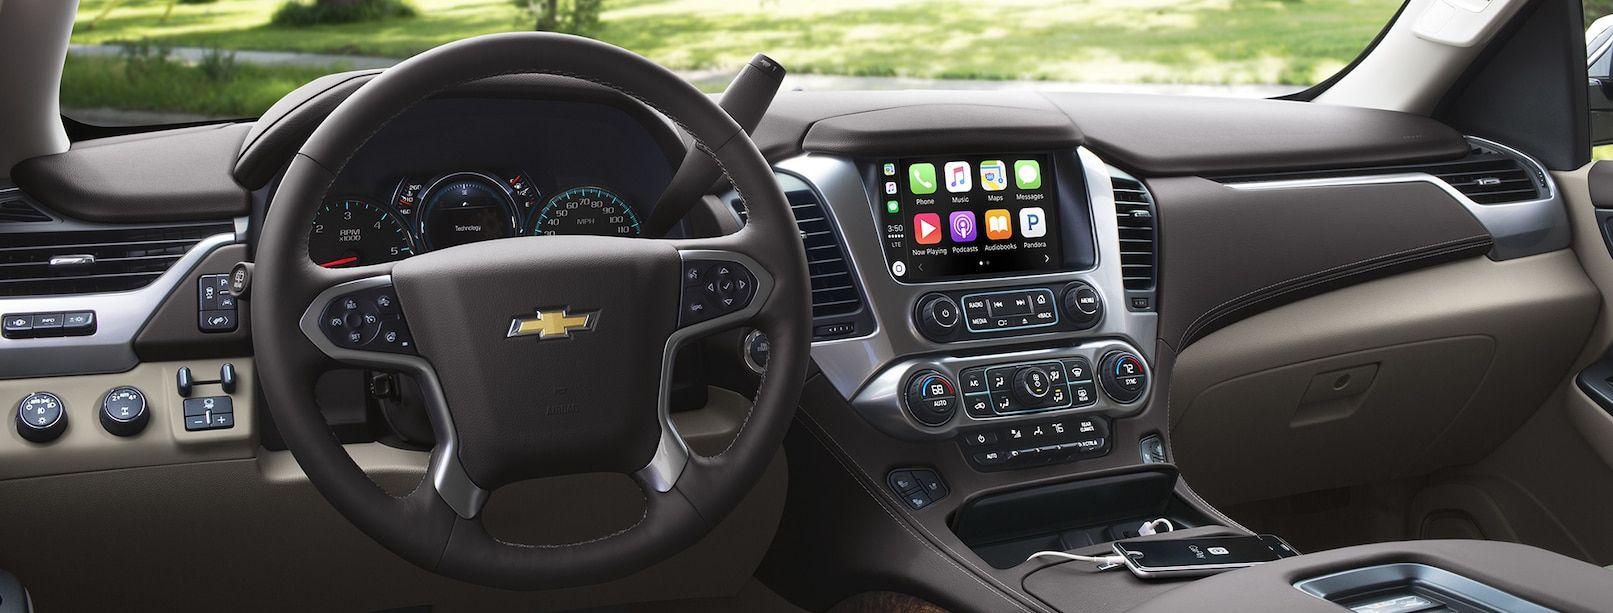 Interior of the 2018 Chevy Suburban